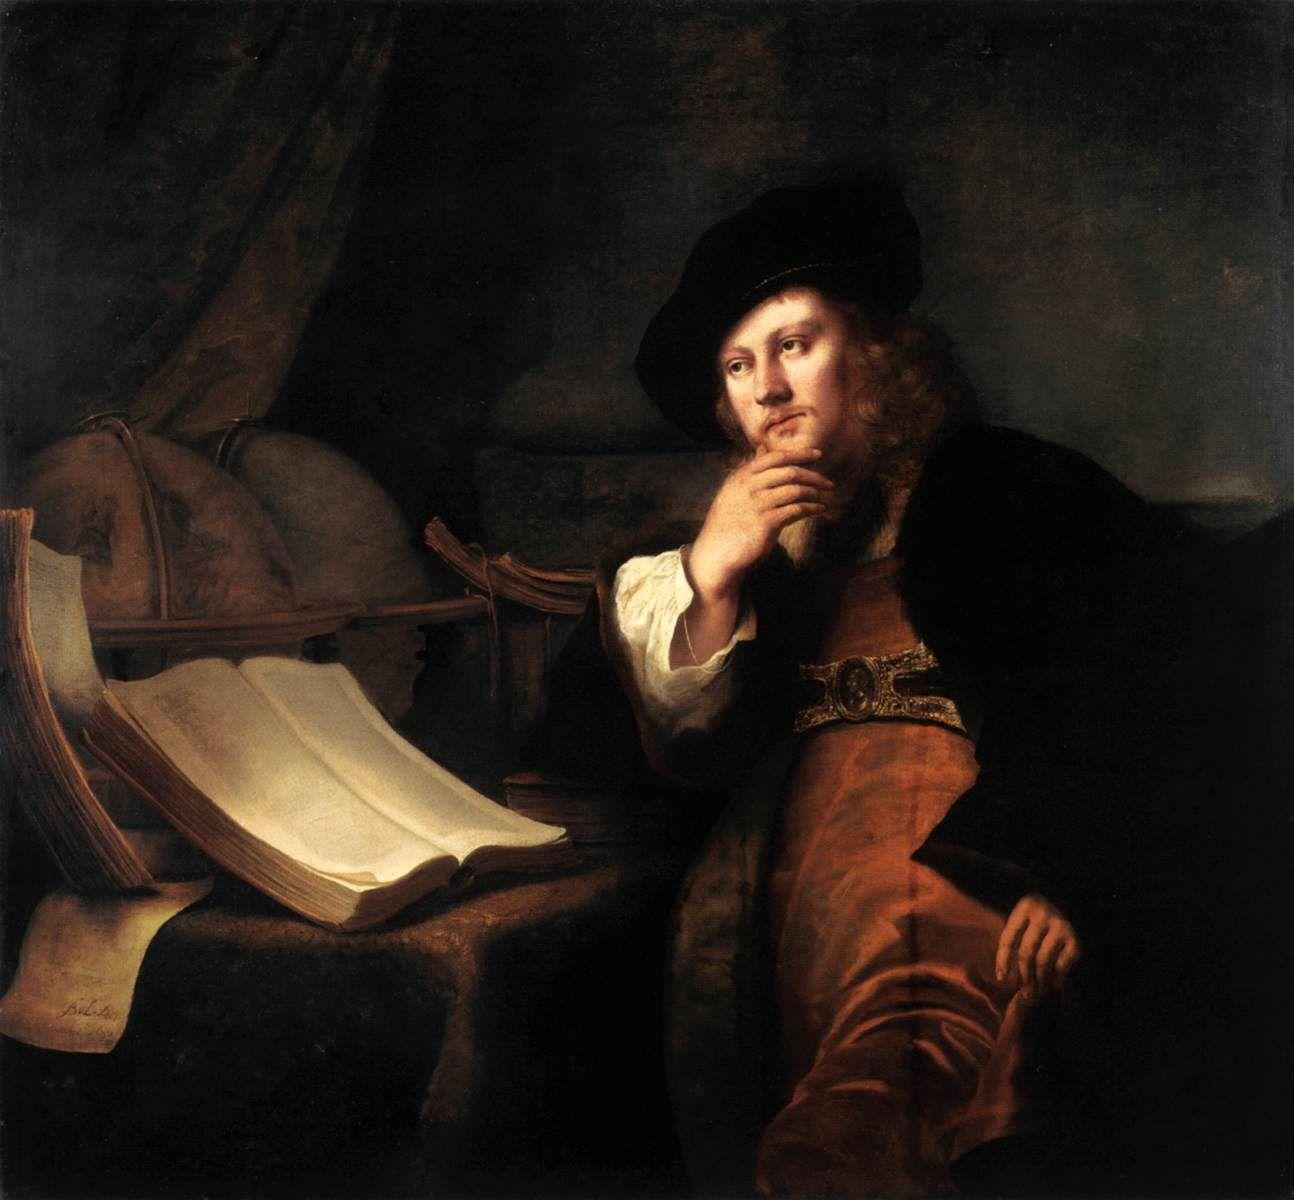 A scholar at his desk 1652 ferdinand bol dutch 1616 1680 a scholar at his desk 1652 ferdinand bol dutch 1616 1680 stopboris Images